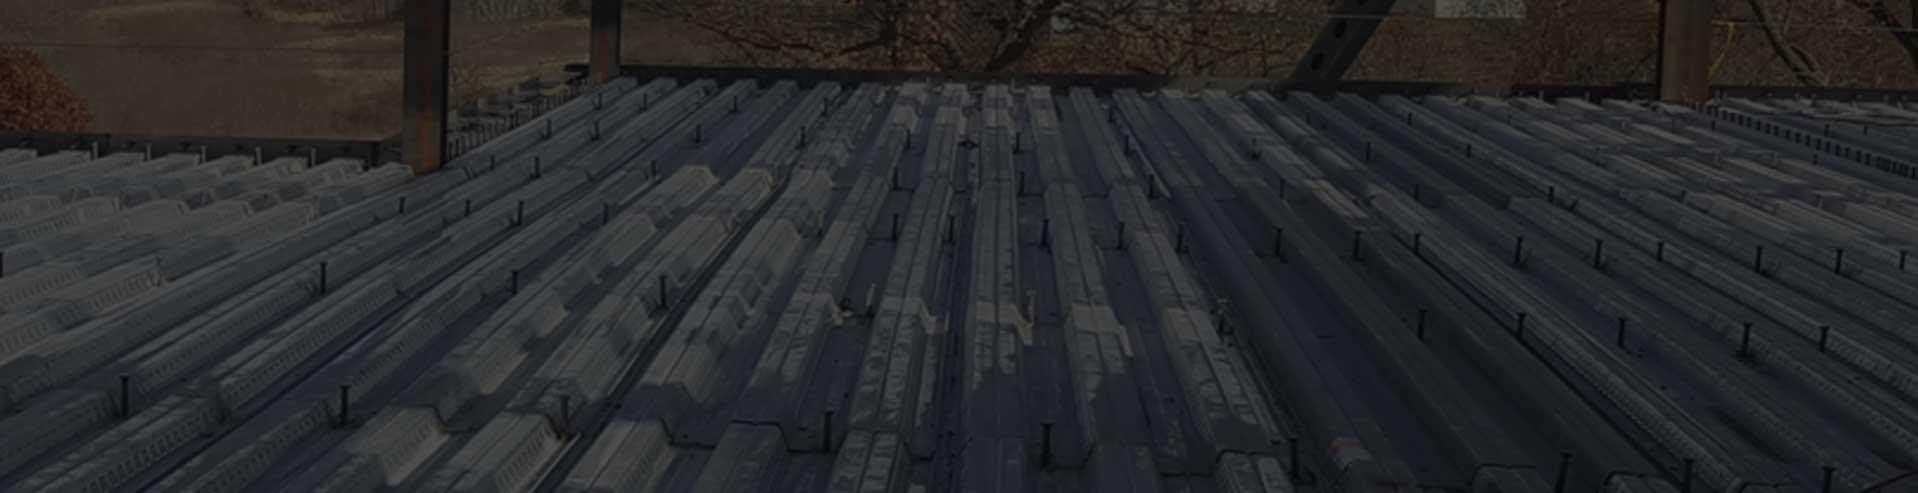 arc welding conveyer belt